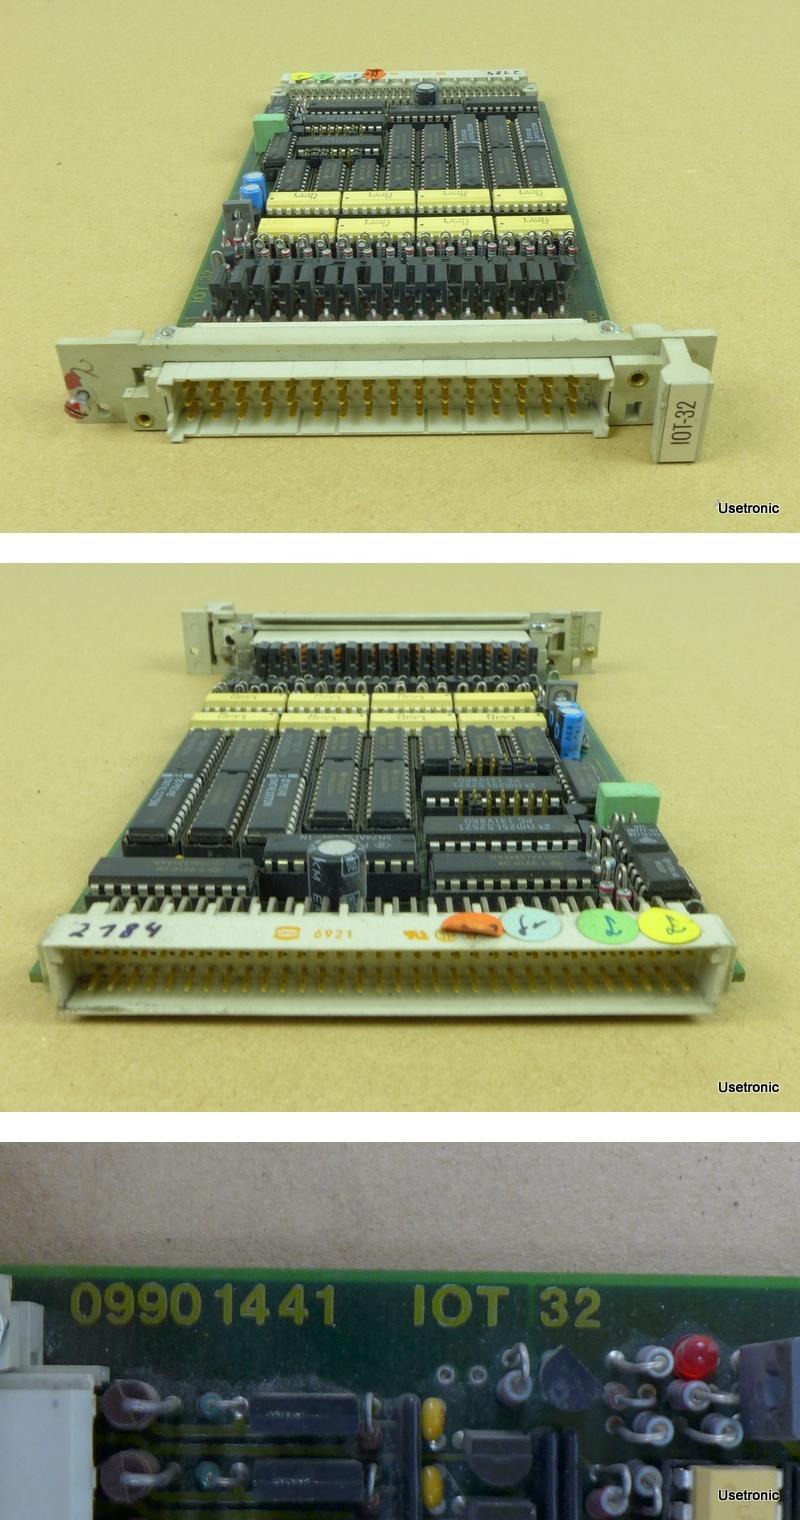 Ferrocontrol IOT 32 09901441